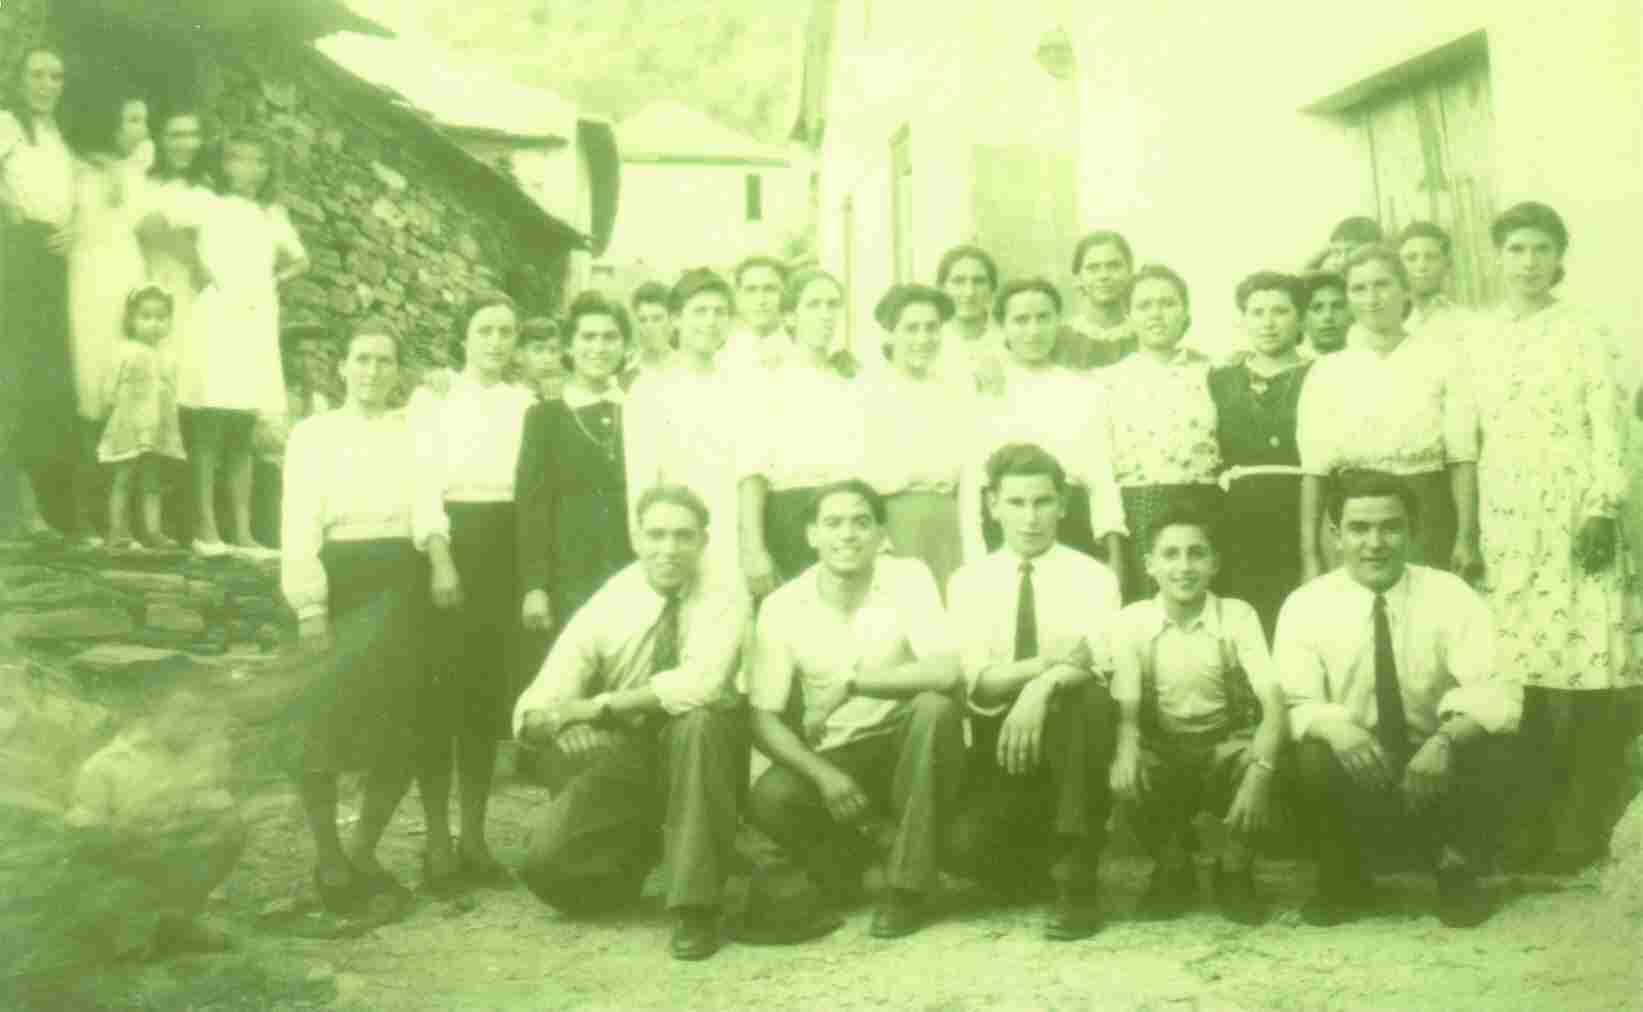 A juventude do Monte Frio no ano de 1947